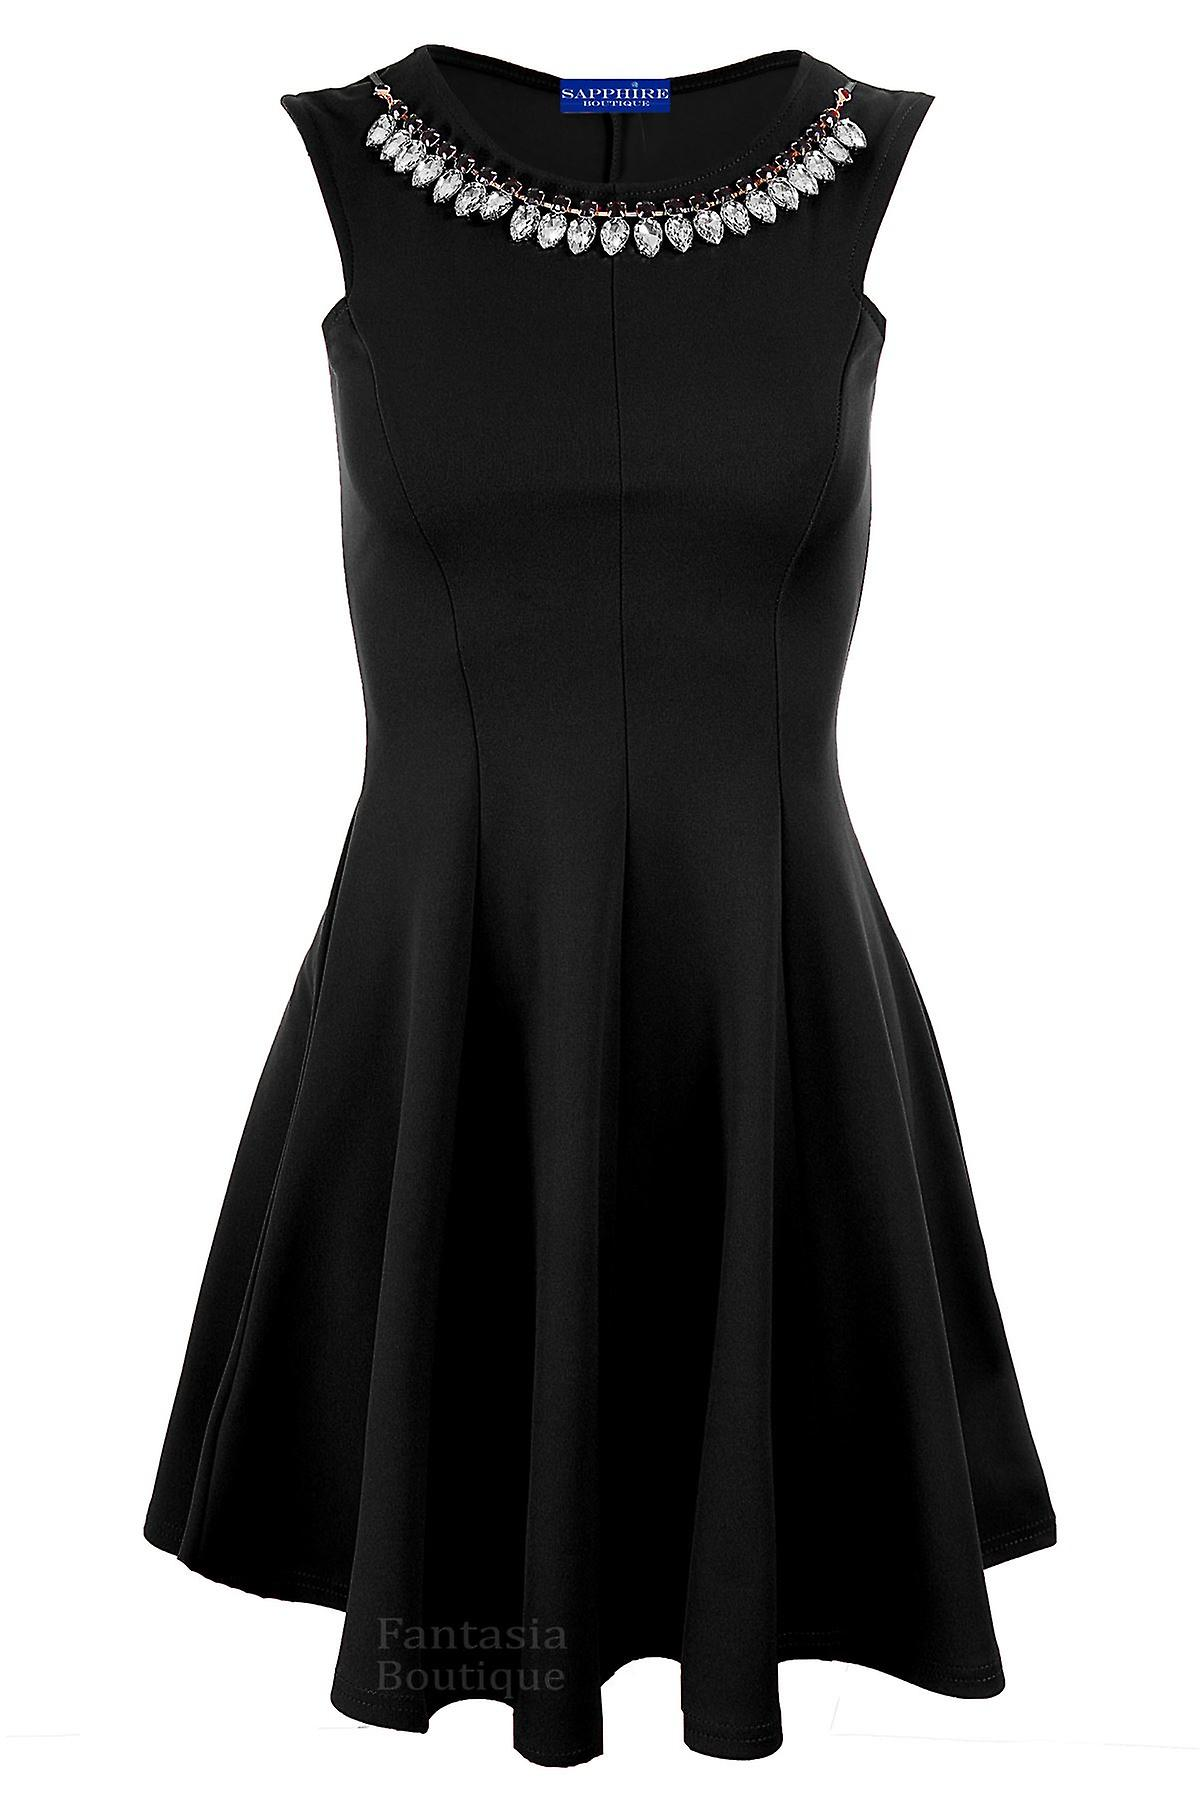 Ladies Sleeveless Dimante Necklace Evening Smart Women's Skater Dress